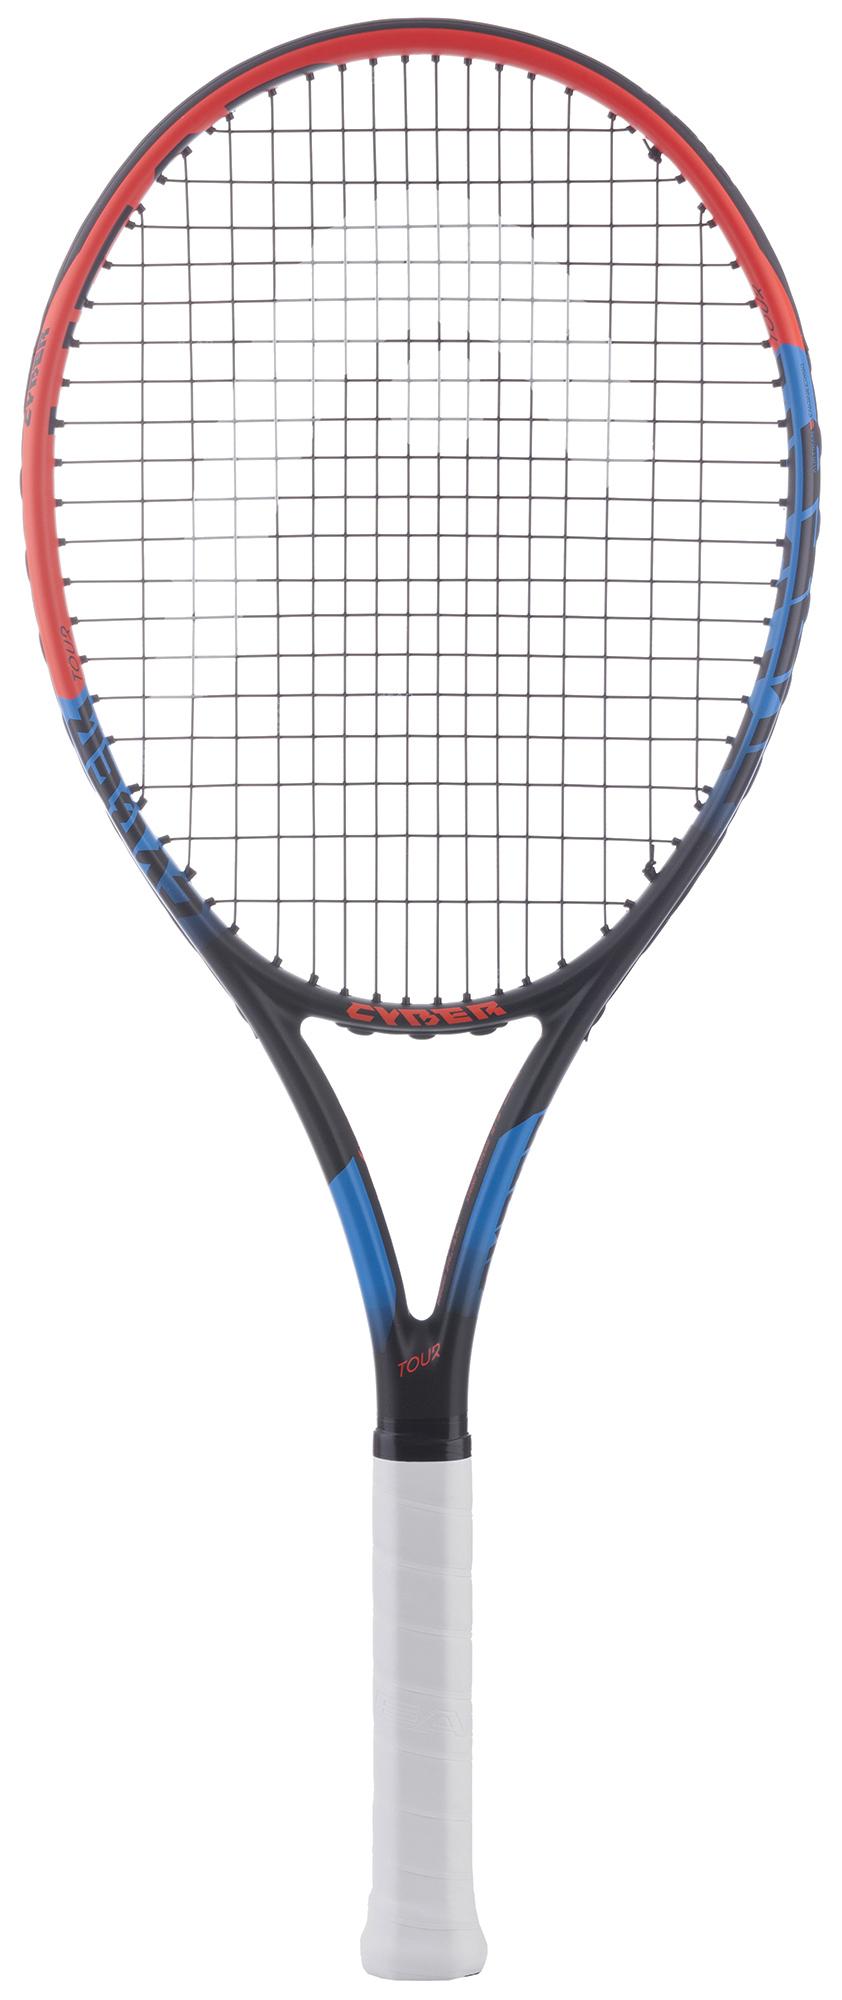 Head Ракетка для большого тенниса Head MX Cyber Tour сетки для тенниса большого